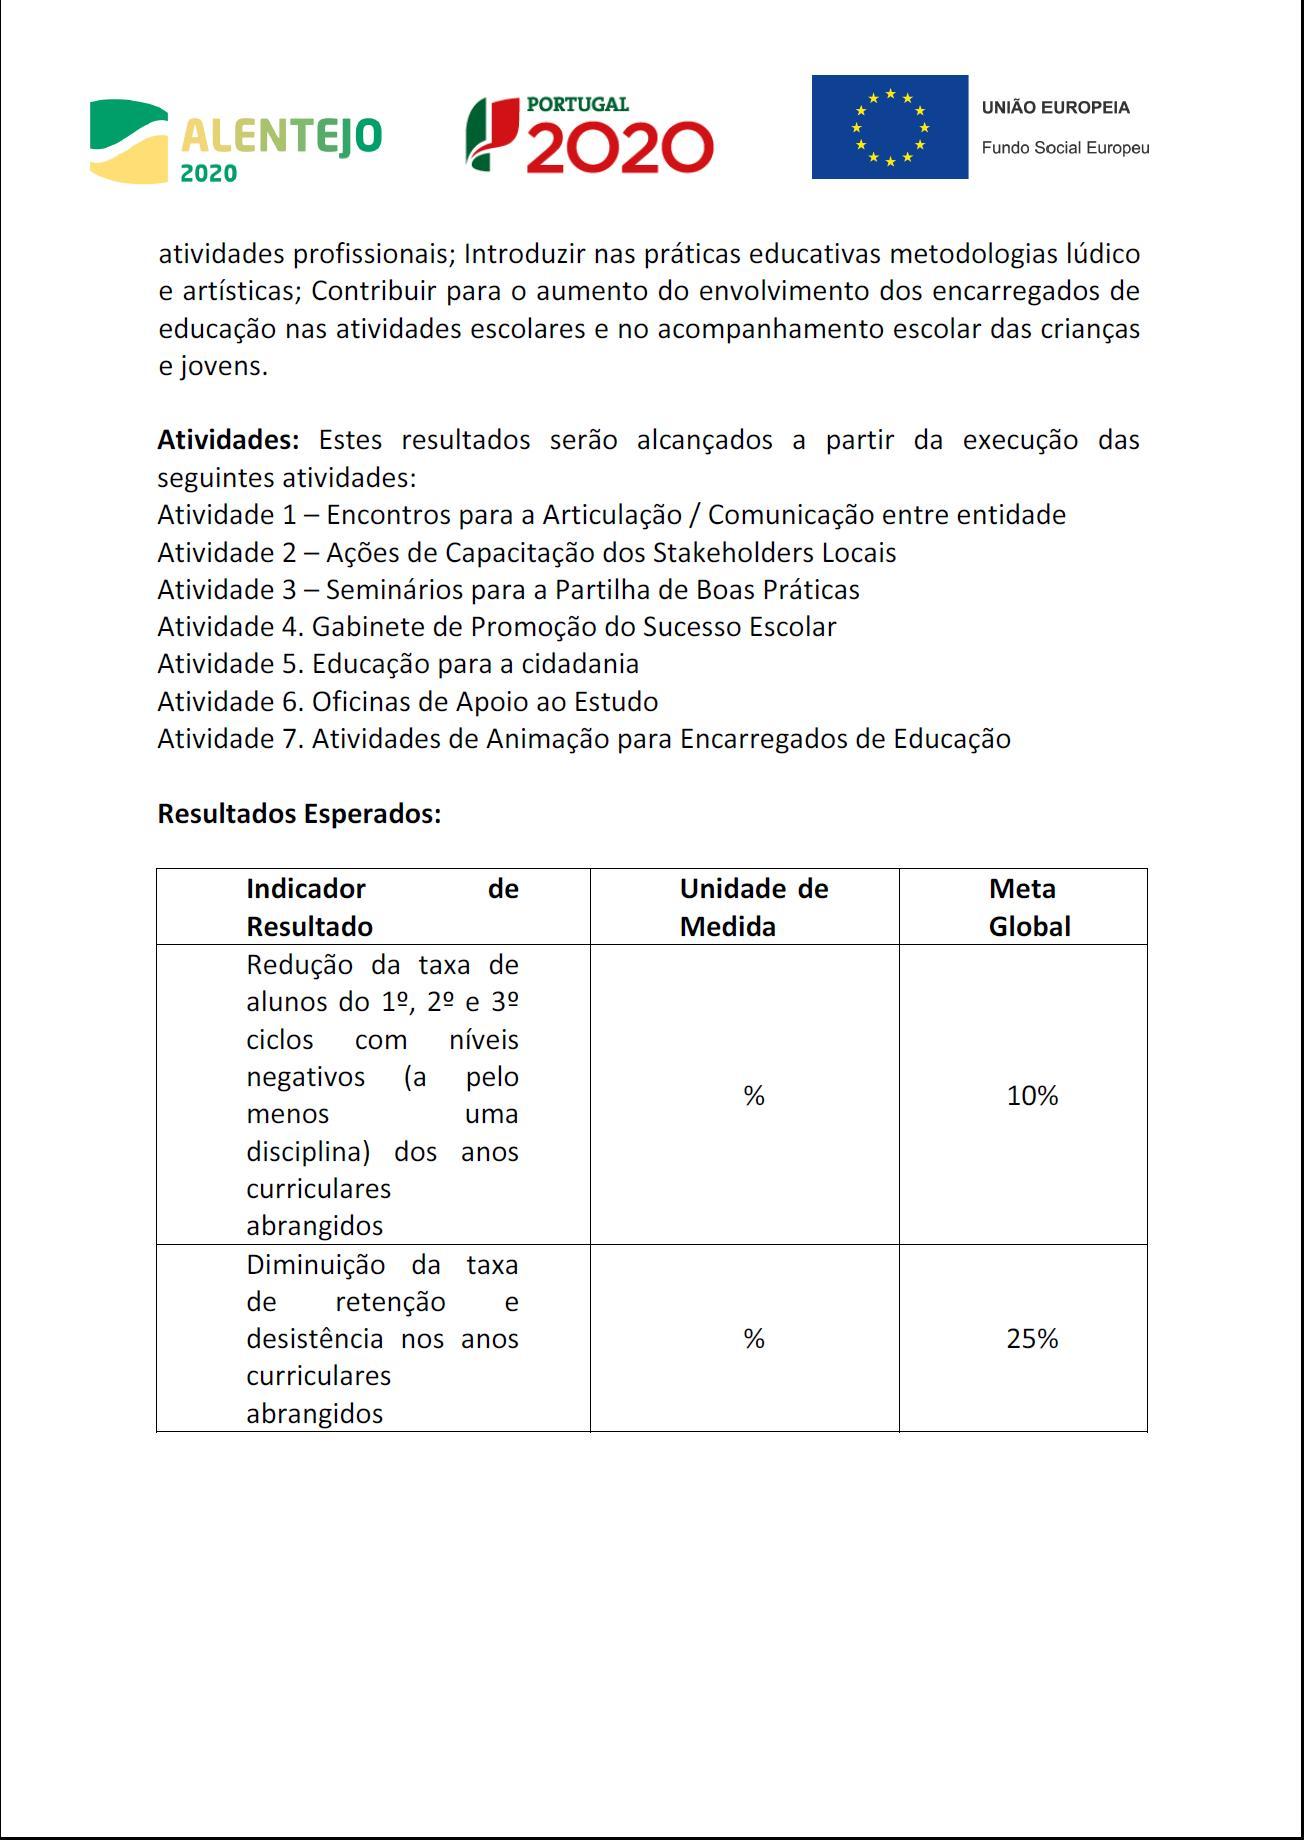 Ficha Sumária do Projeto - folha 2